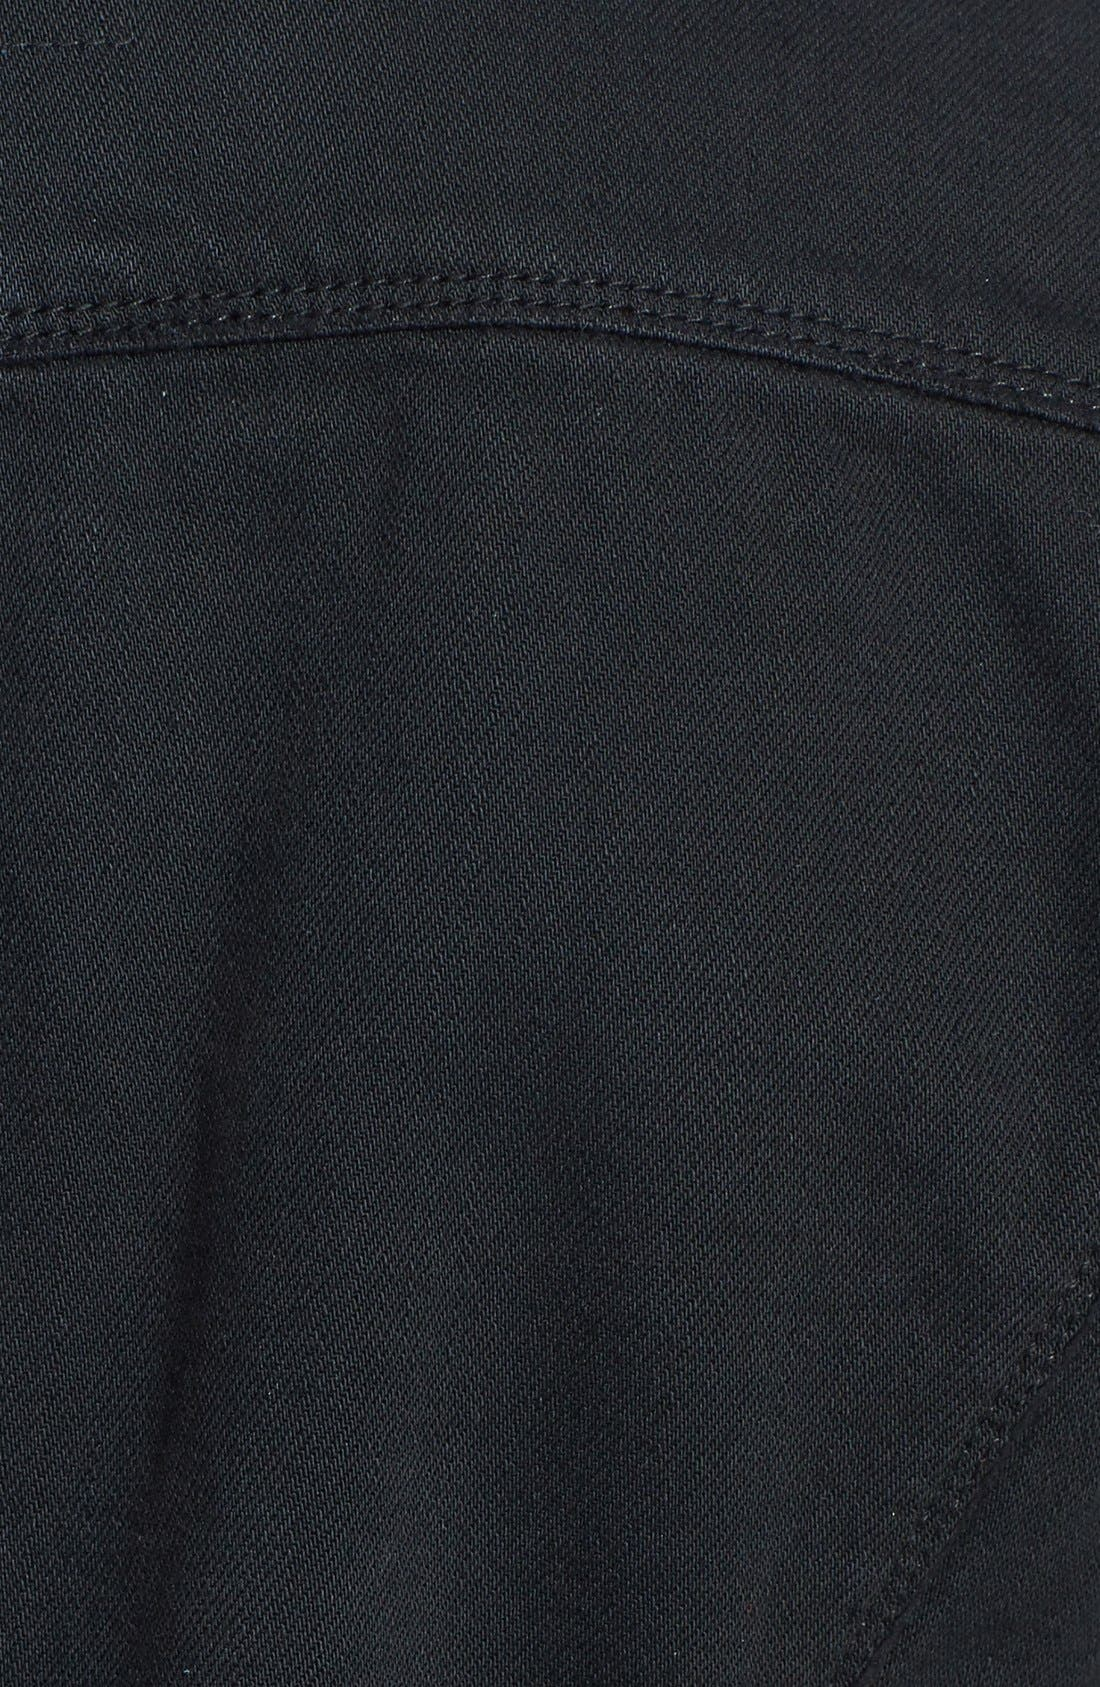 Alternate Image 3  - Paige Denim 'Vermont' Distressed Denim Jacket (Vintage Black)